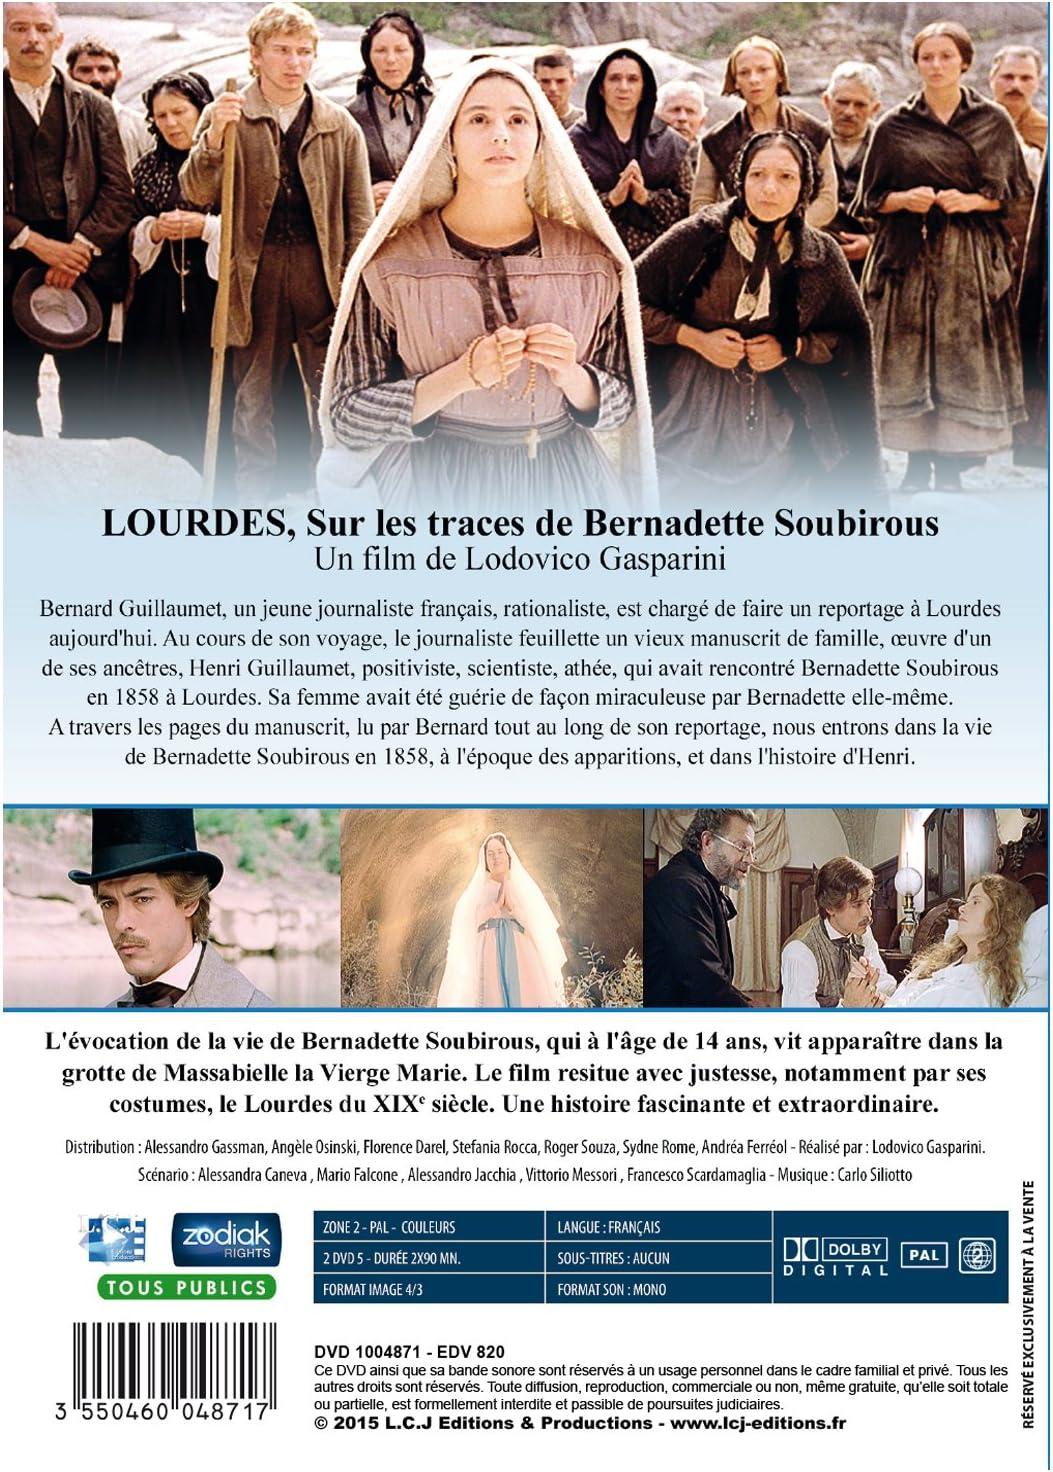 SOUBIROUS FILM BERNADETTE TÉLÉCHARGER